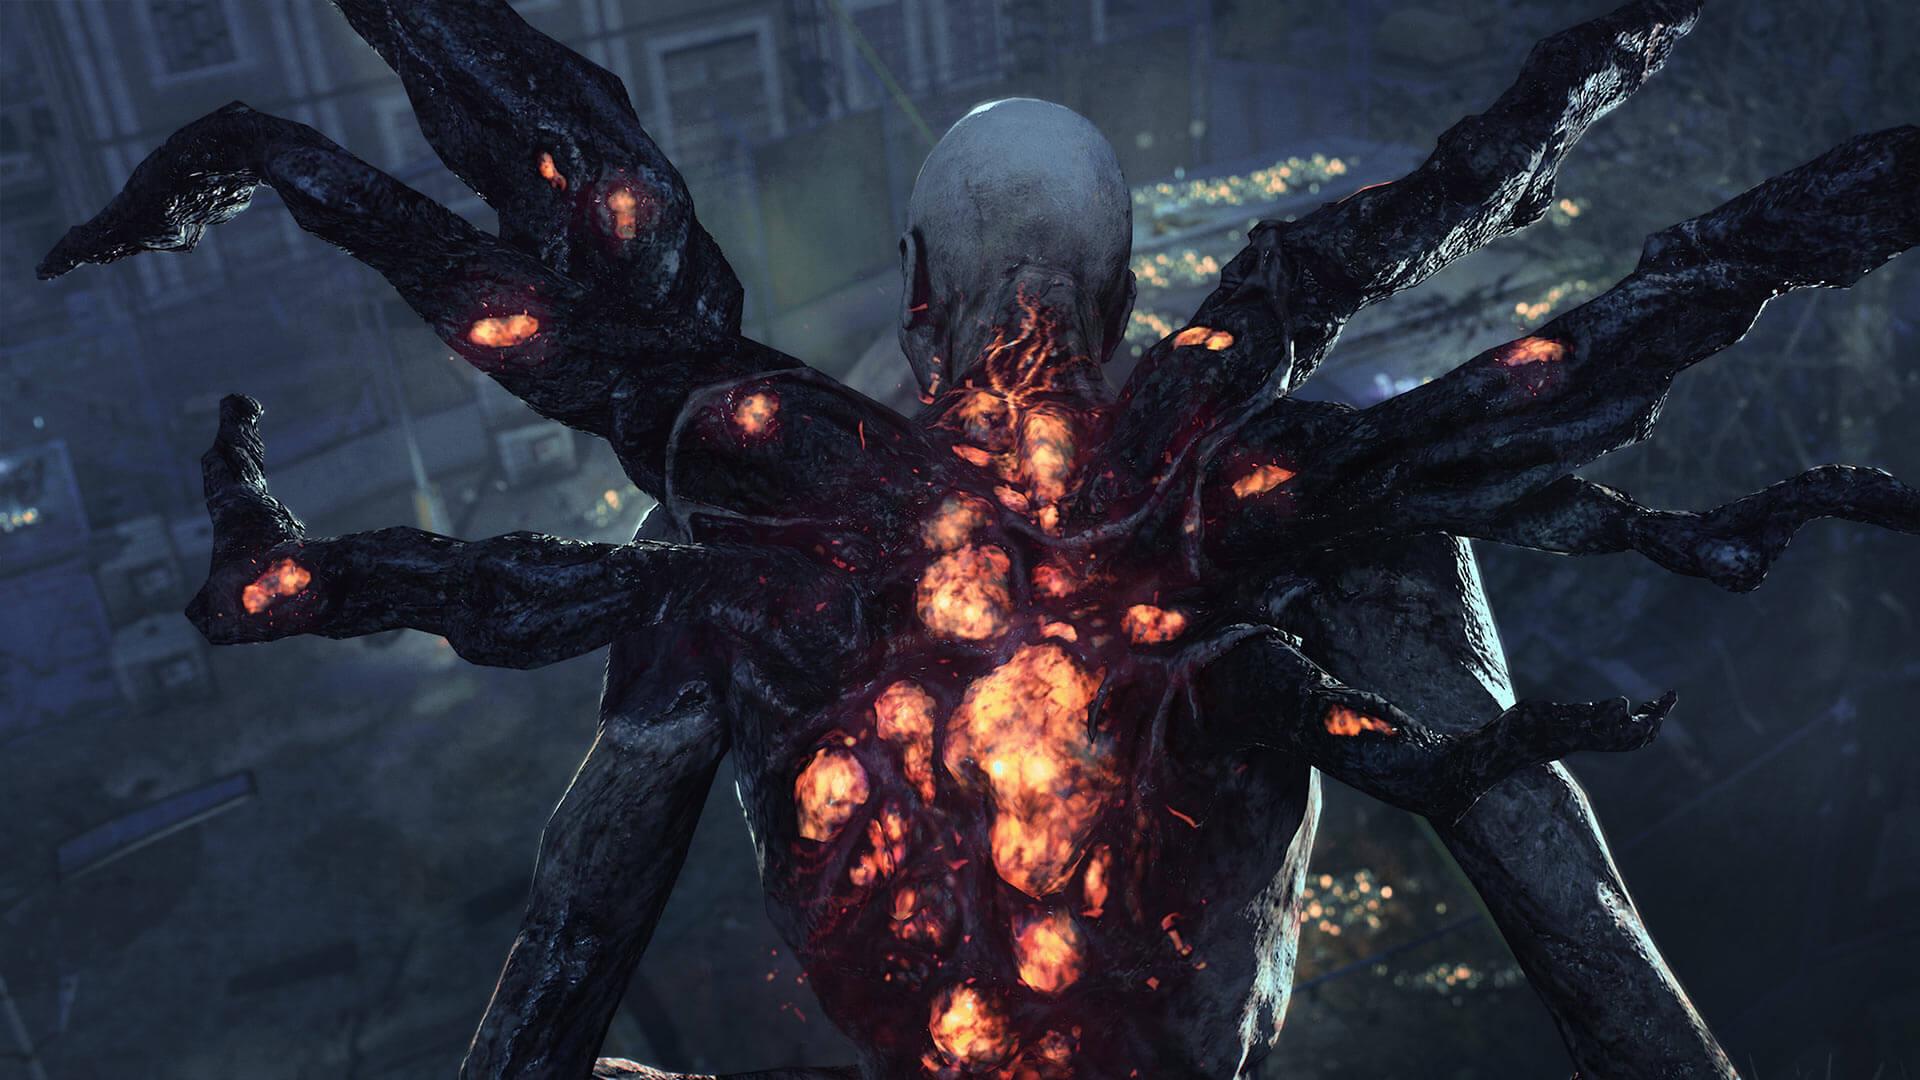 Image for Dying Light 2's next developer stream will focus on the game's open world